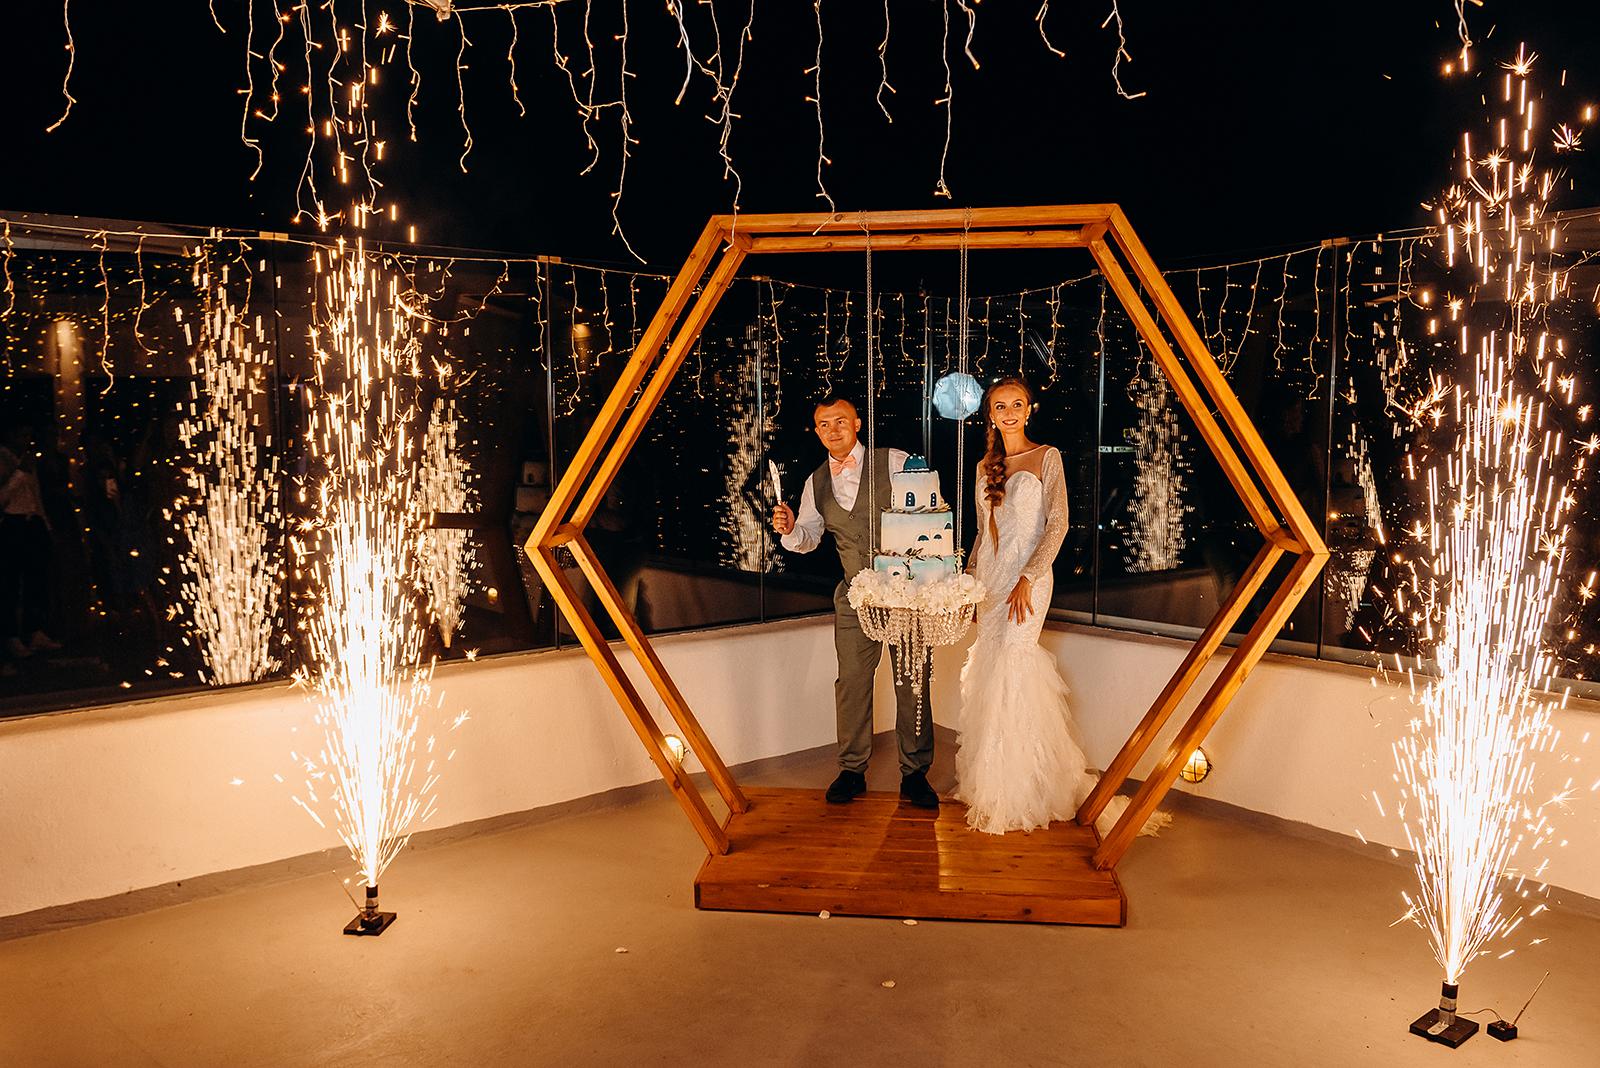 Свадебные фейерверки: свадьба на санторини, свадебное агентство Julia Veselova - Фото 1